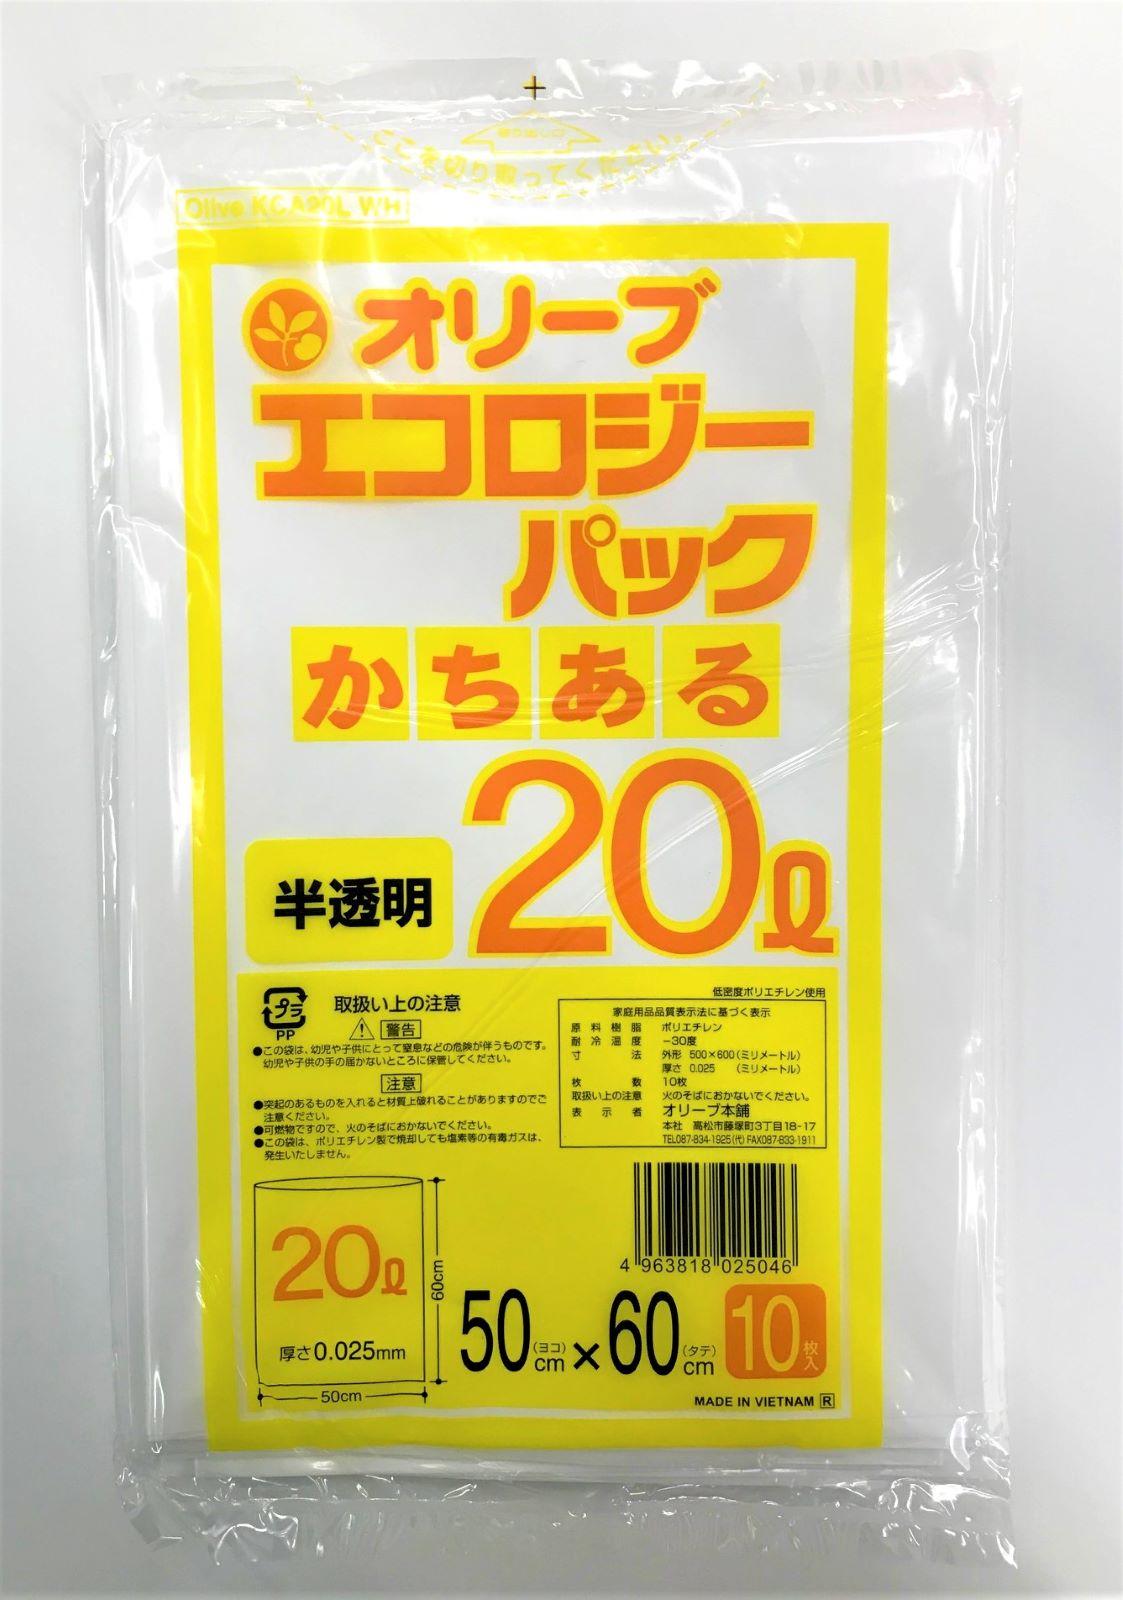 20L小さ目のダストボックスに最適です ゴミ袋 半透明 20L 1ケース 10枚入 1ケース60冊 秀逸 オリーブ エコロジーパック 『4年保証』 かちある 業務用 ごみ袋 掃除 ポリ袋 ダストボックス ゴミ レジ レジ袋 ビニール袋 ふくろ 清掃